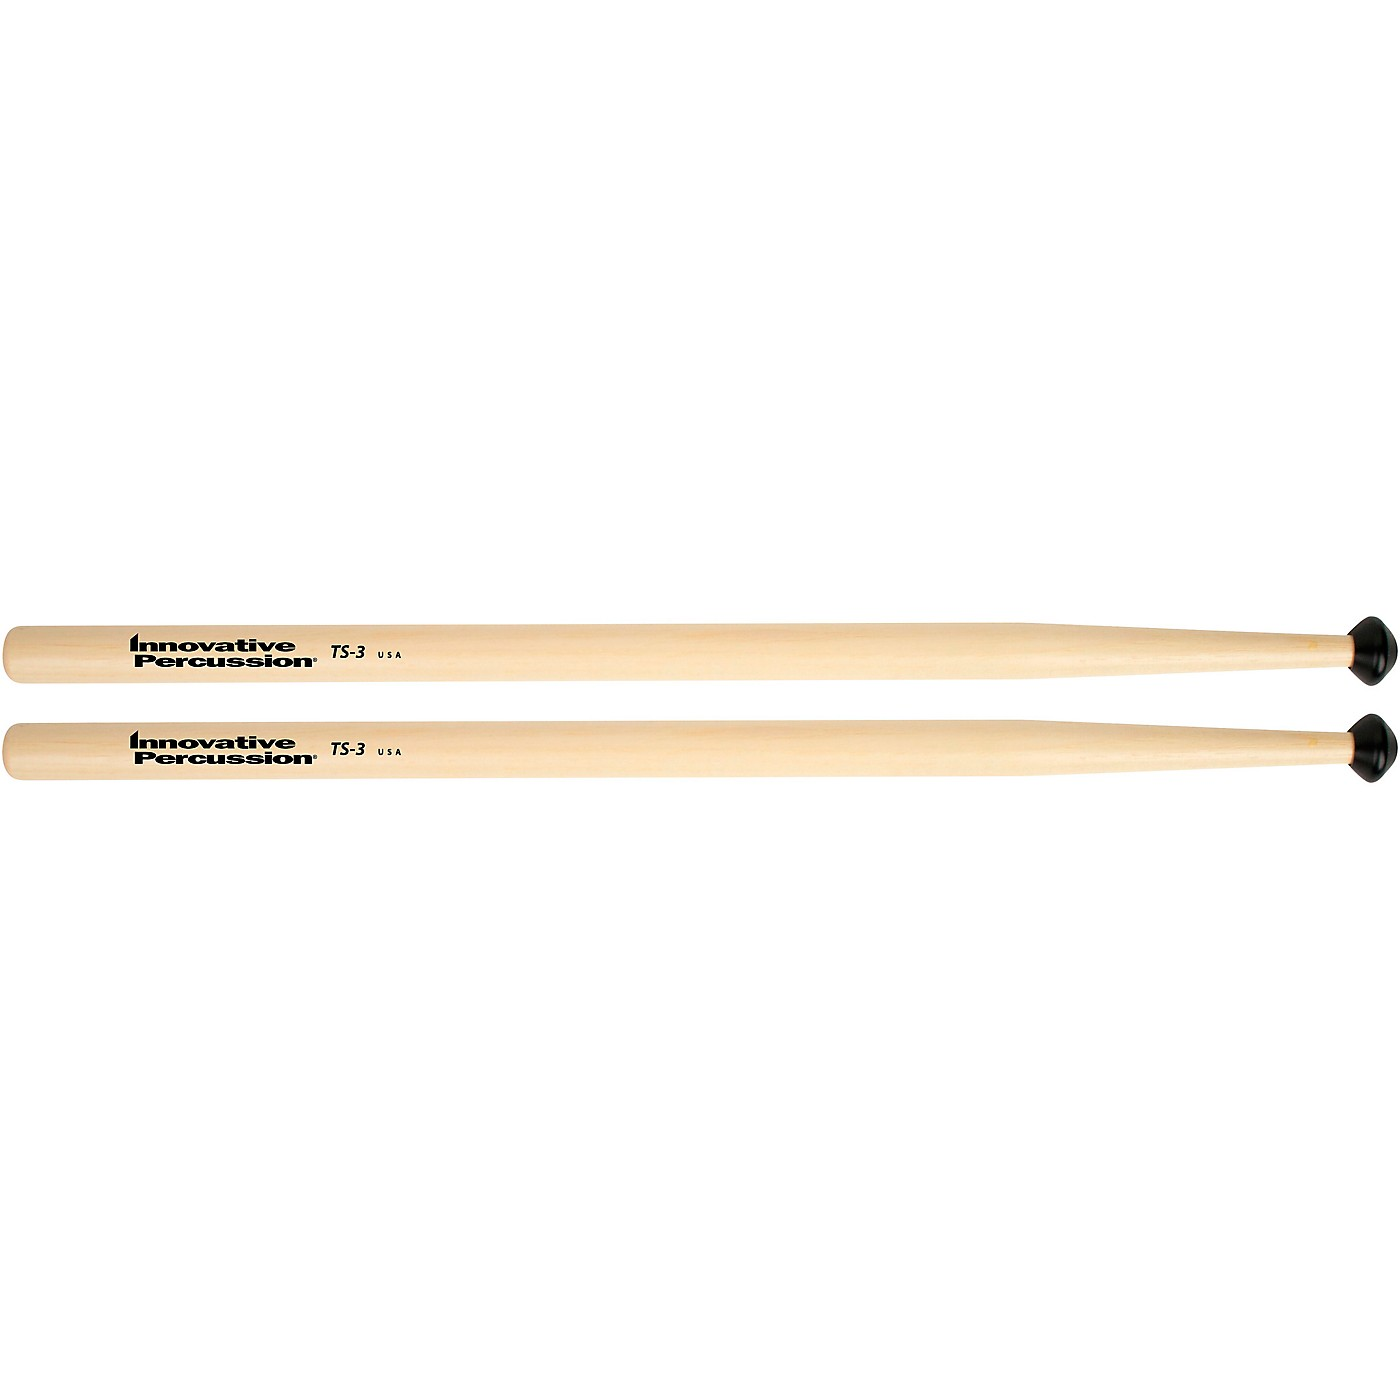 Innovative Percussion TS-3 Multi-Tom Marching Drum Stick thumbnail